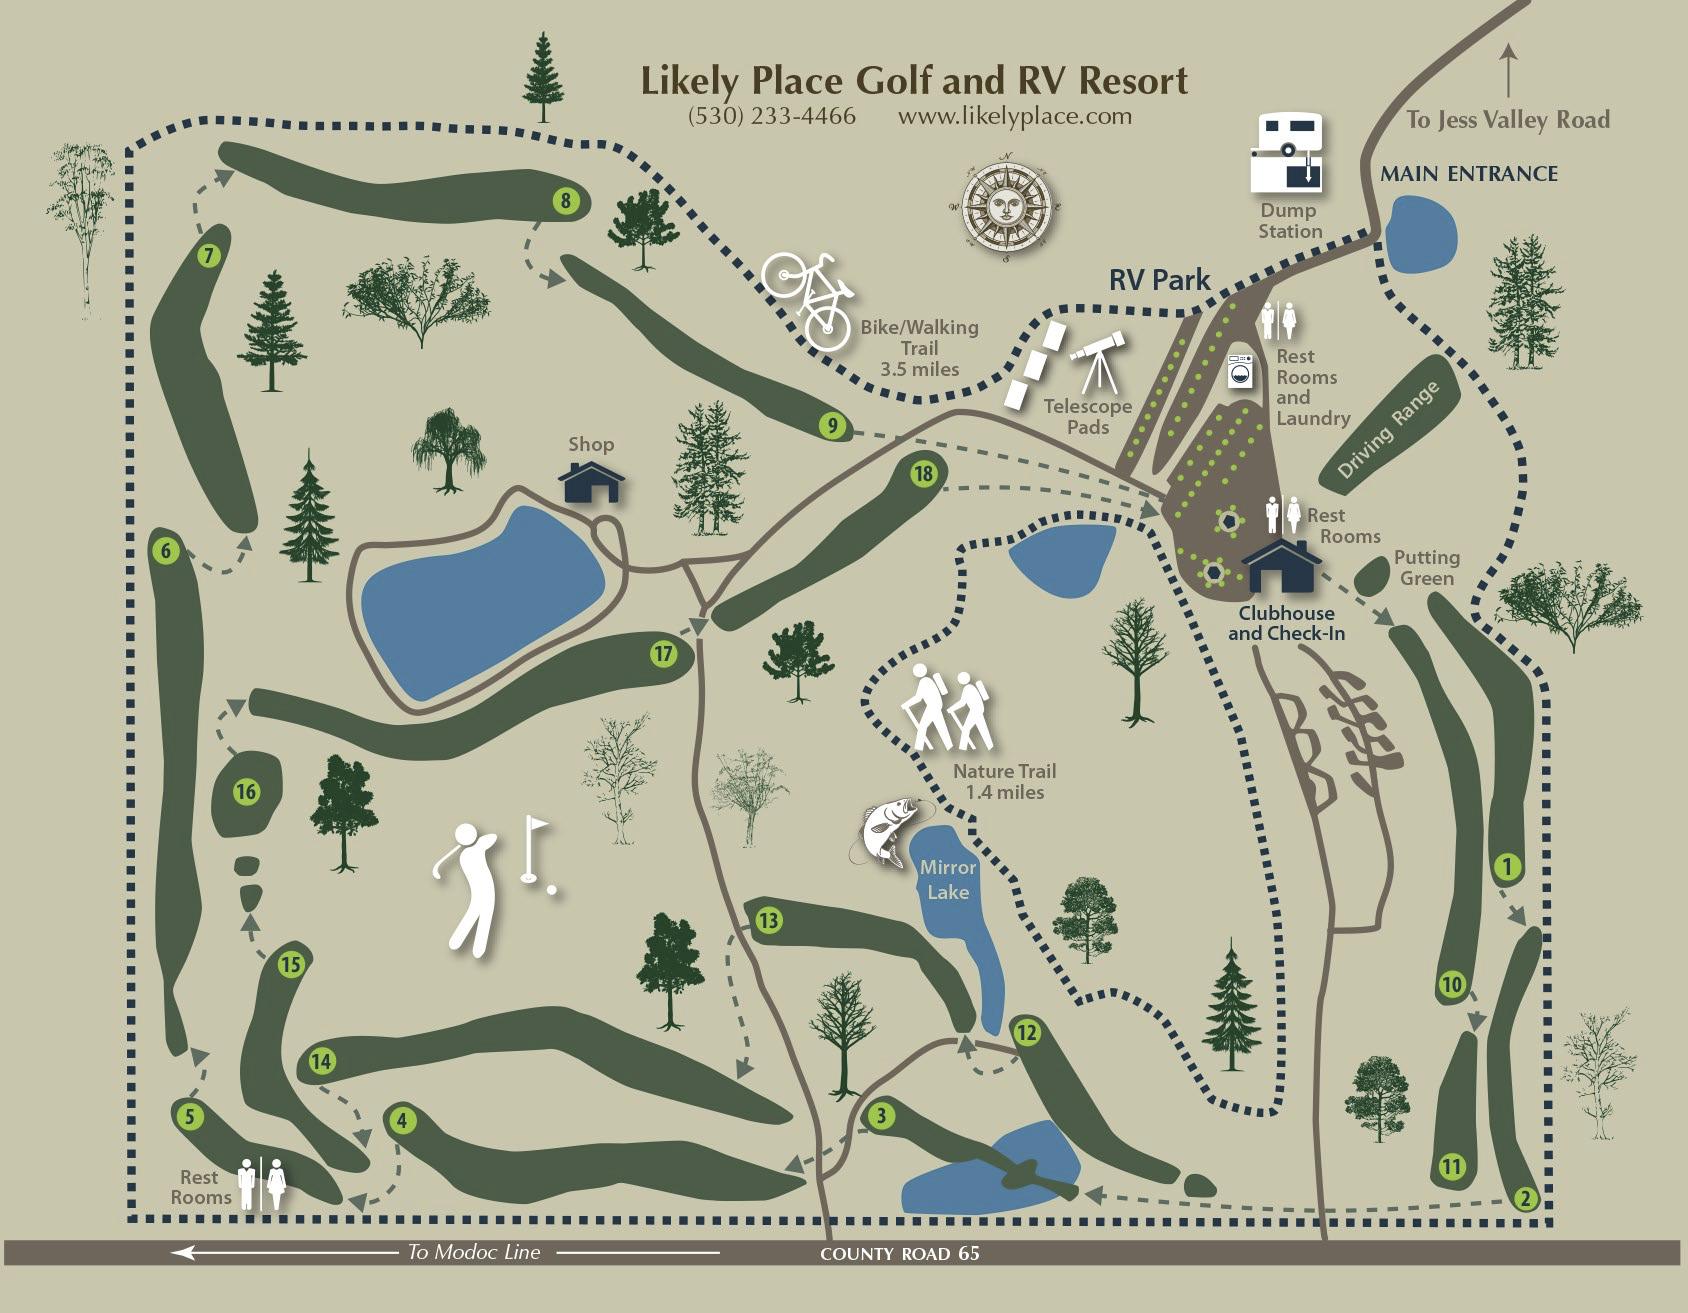 Areas You Can Atv In Southern California Map.Hiking Biking Touring Near Golf Rv Park In Ne California